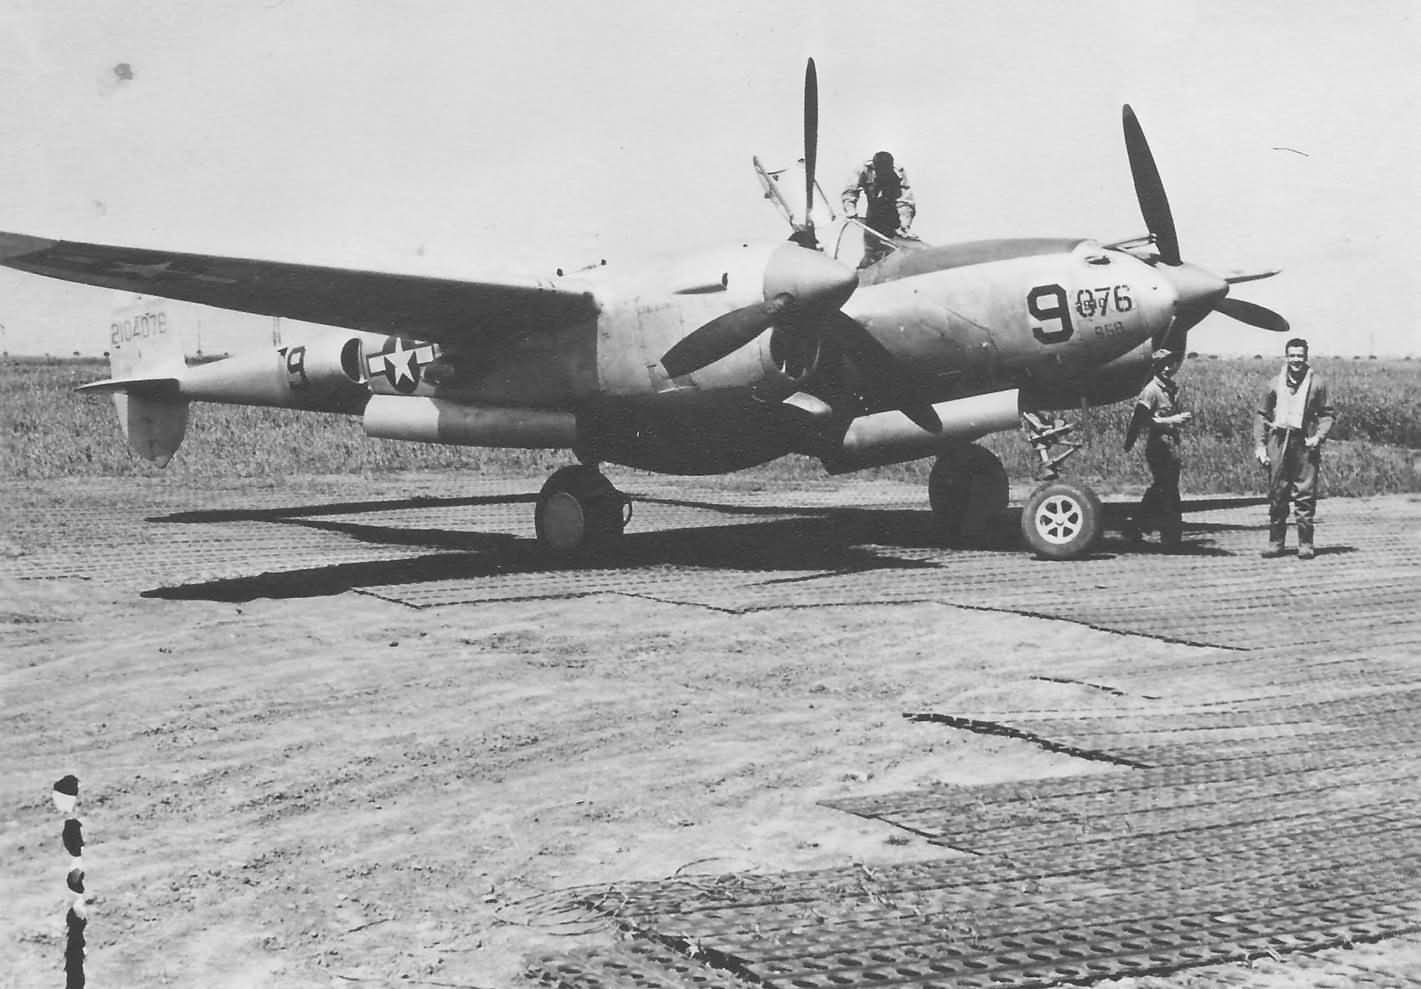 P-38 1944 Italy 42-104076 14th FG 48th FS